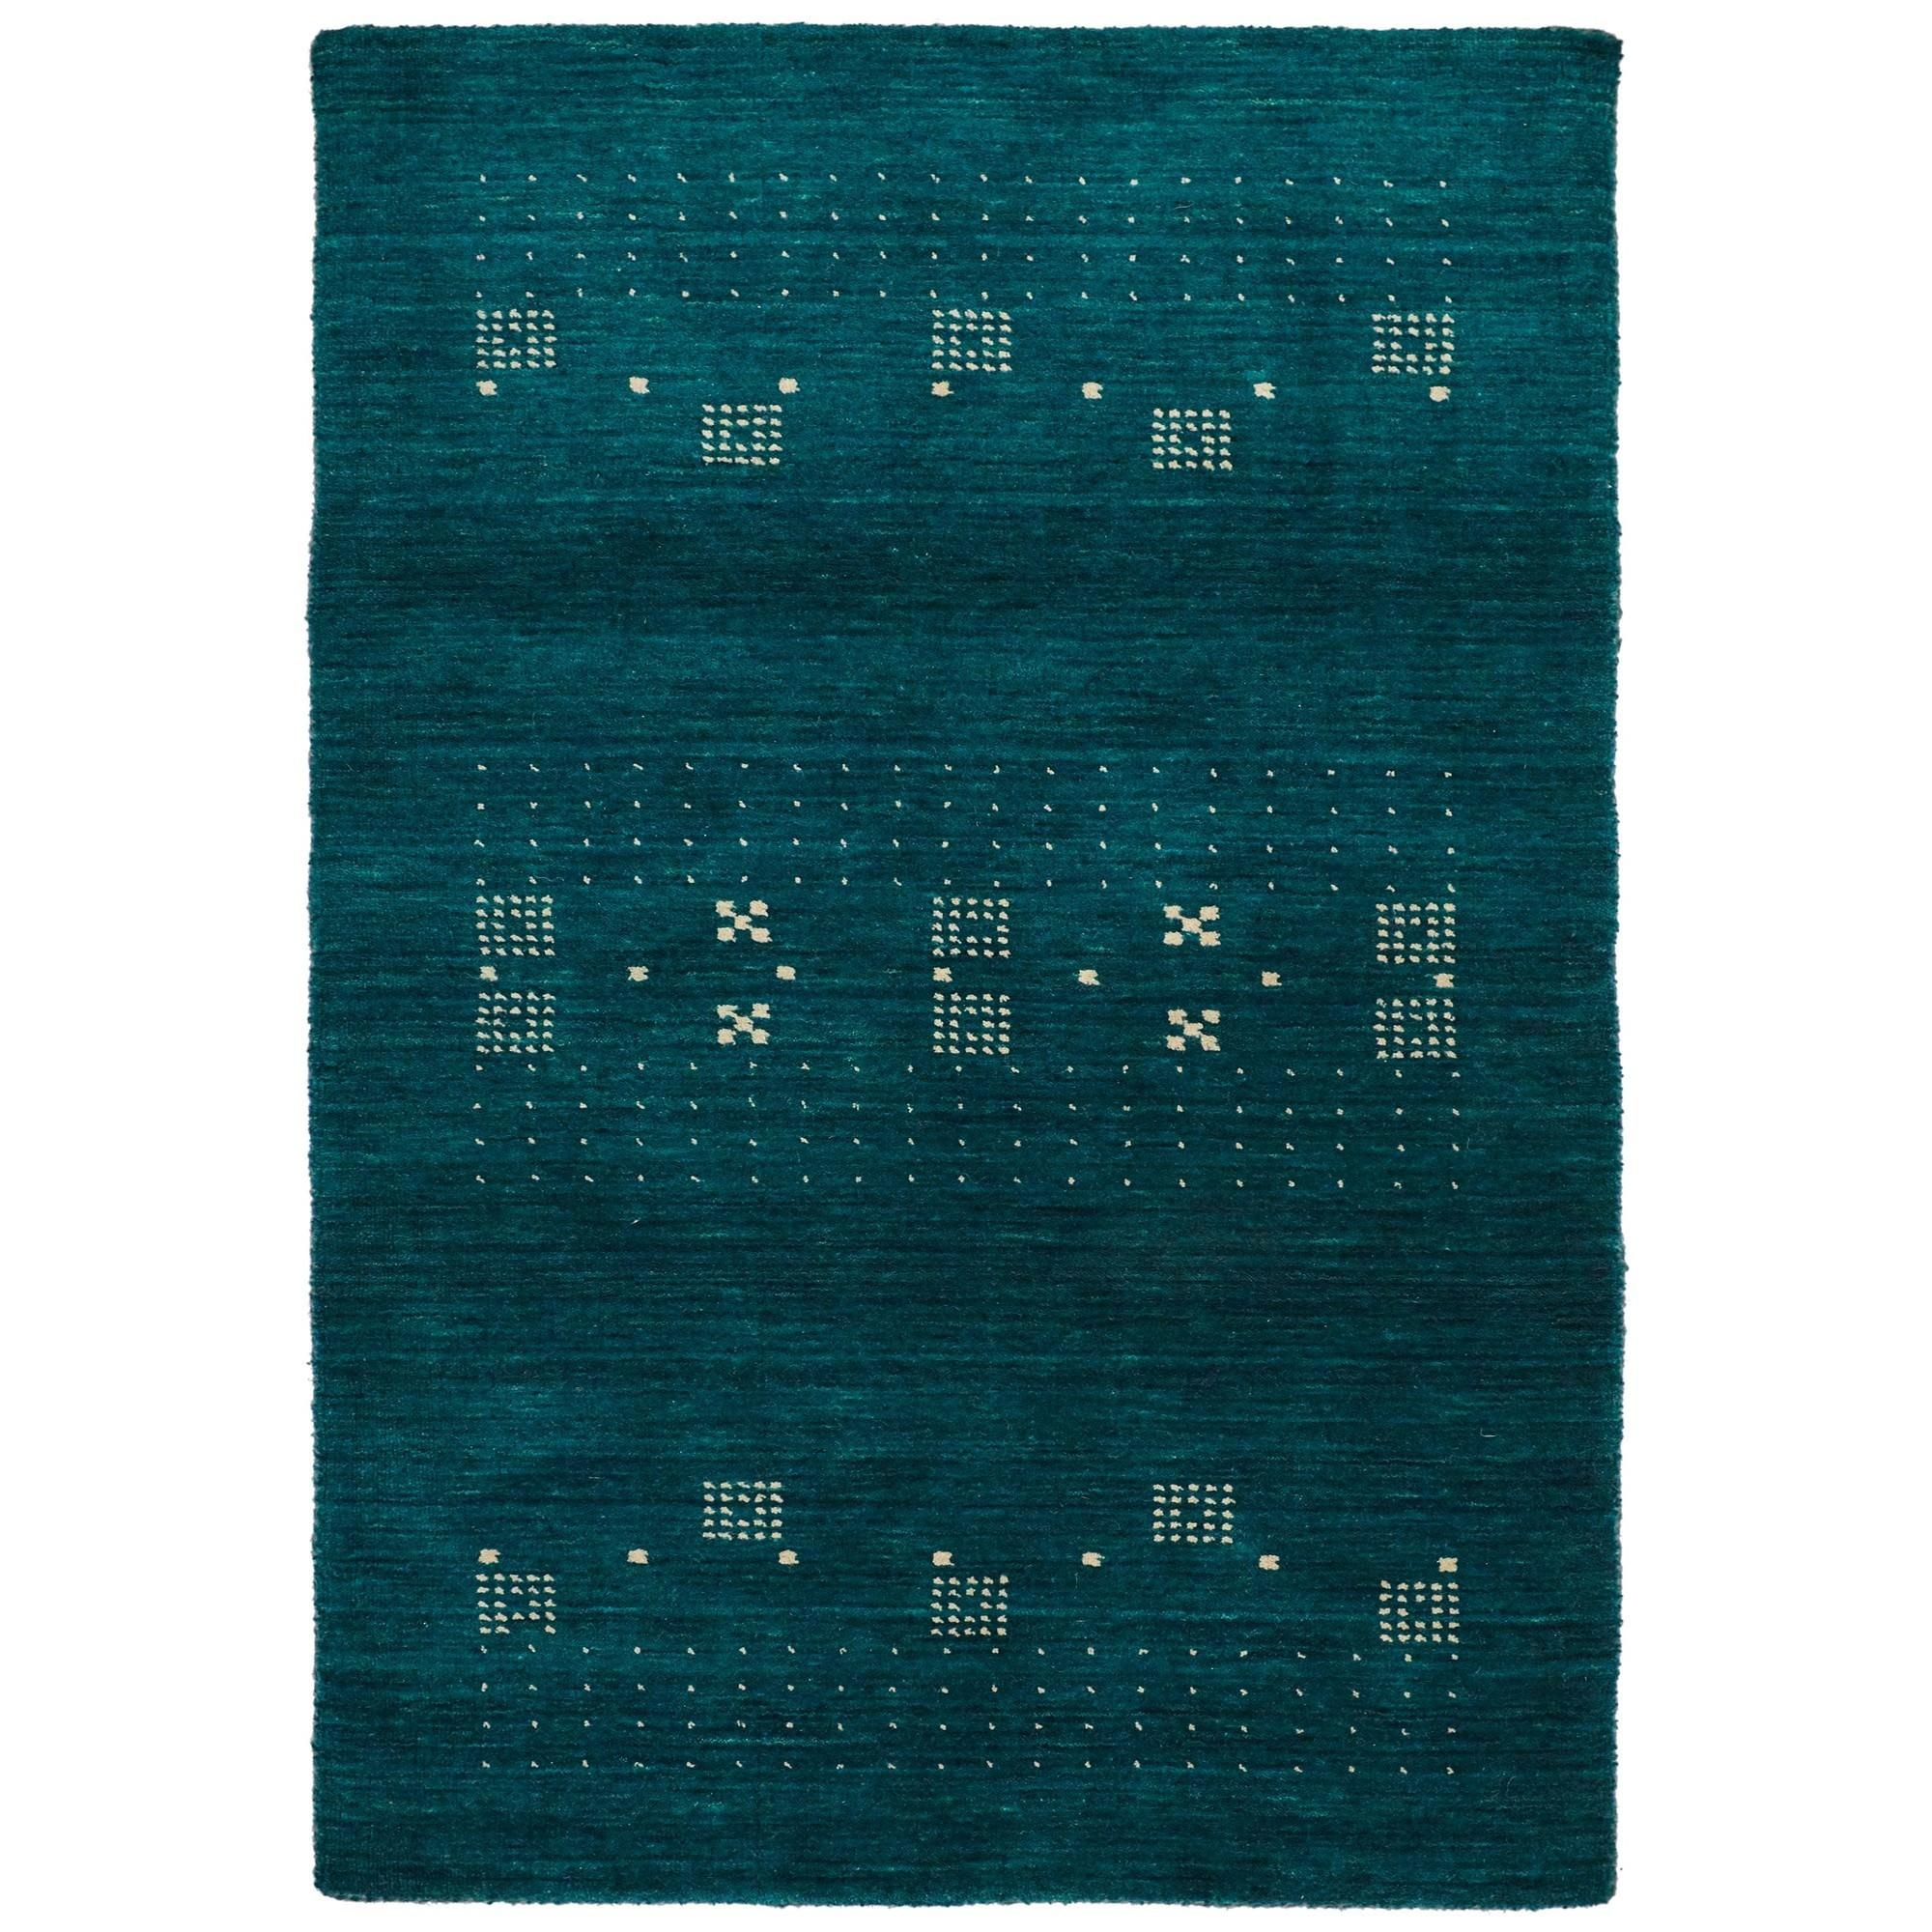 Lori No.042 Wool Tribal Rug, 290x200cm, Turquoise